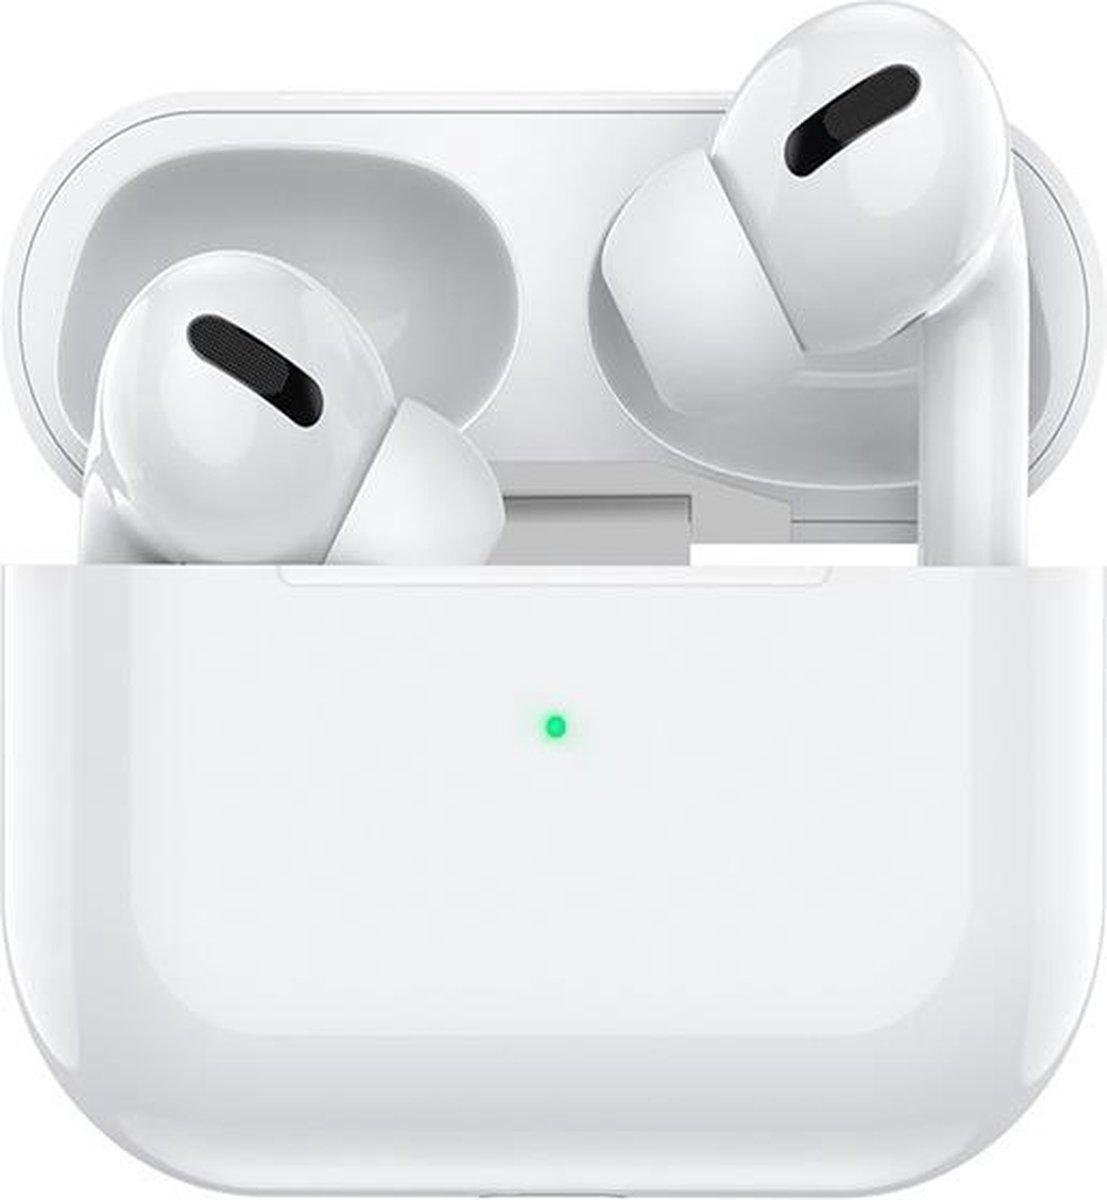 Draadloze Oordopjes - Bluetooth Oortjes - Draadloze Bluetooth Oortjes - Earpods - Oortjes - Airpods